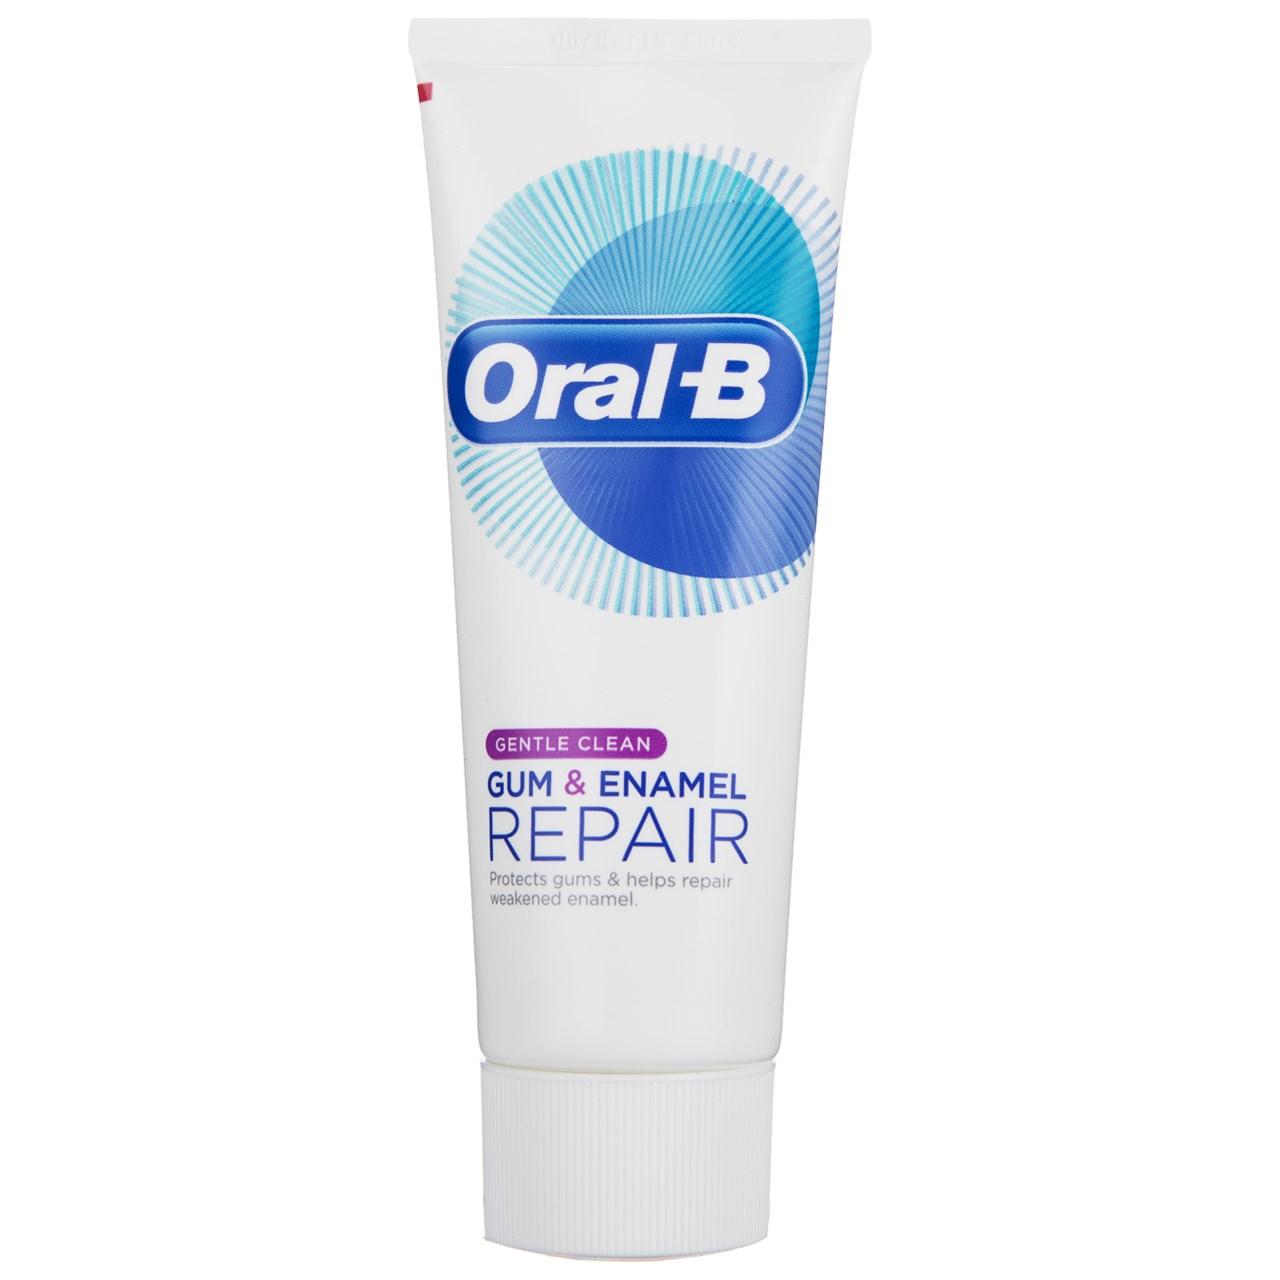 قیمت خمیر دندان اورال بی سری Gum And Enamel Repair مدل Gentle Clean حجم 75 میلی لیتر